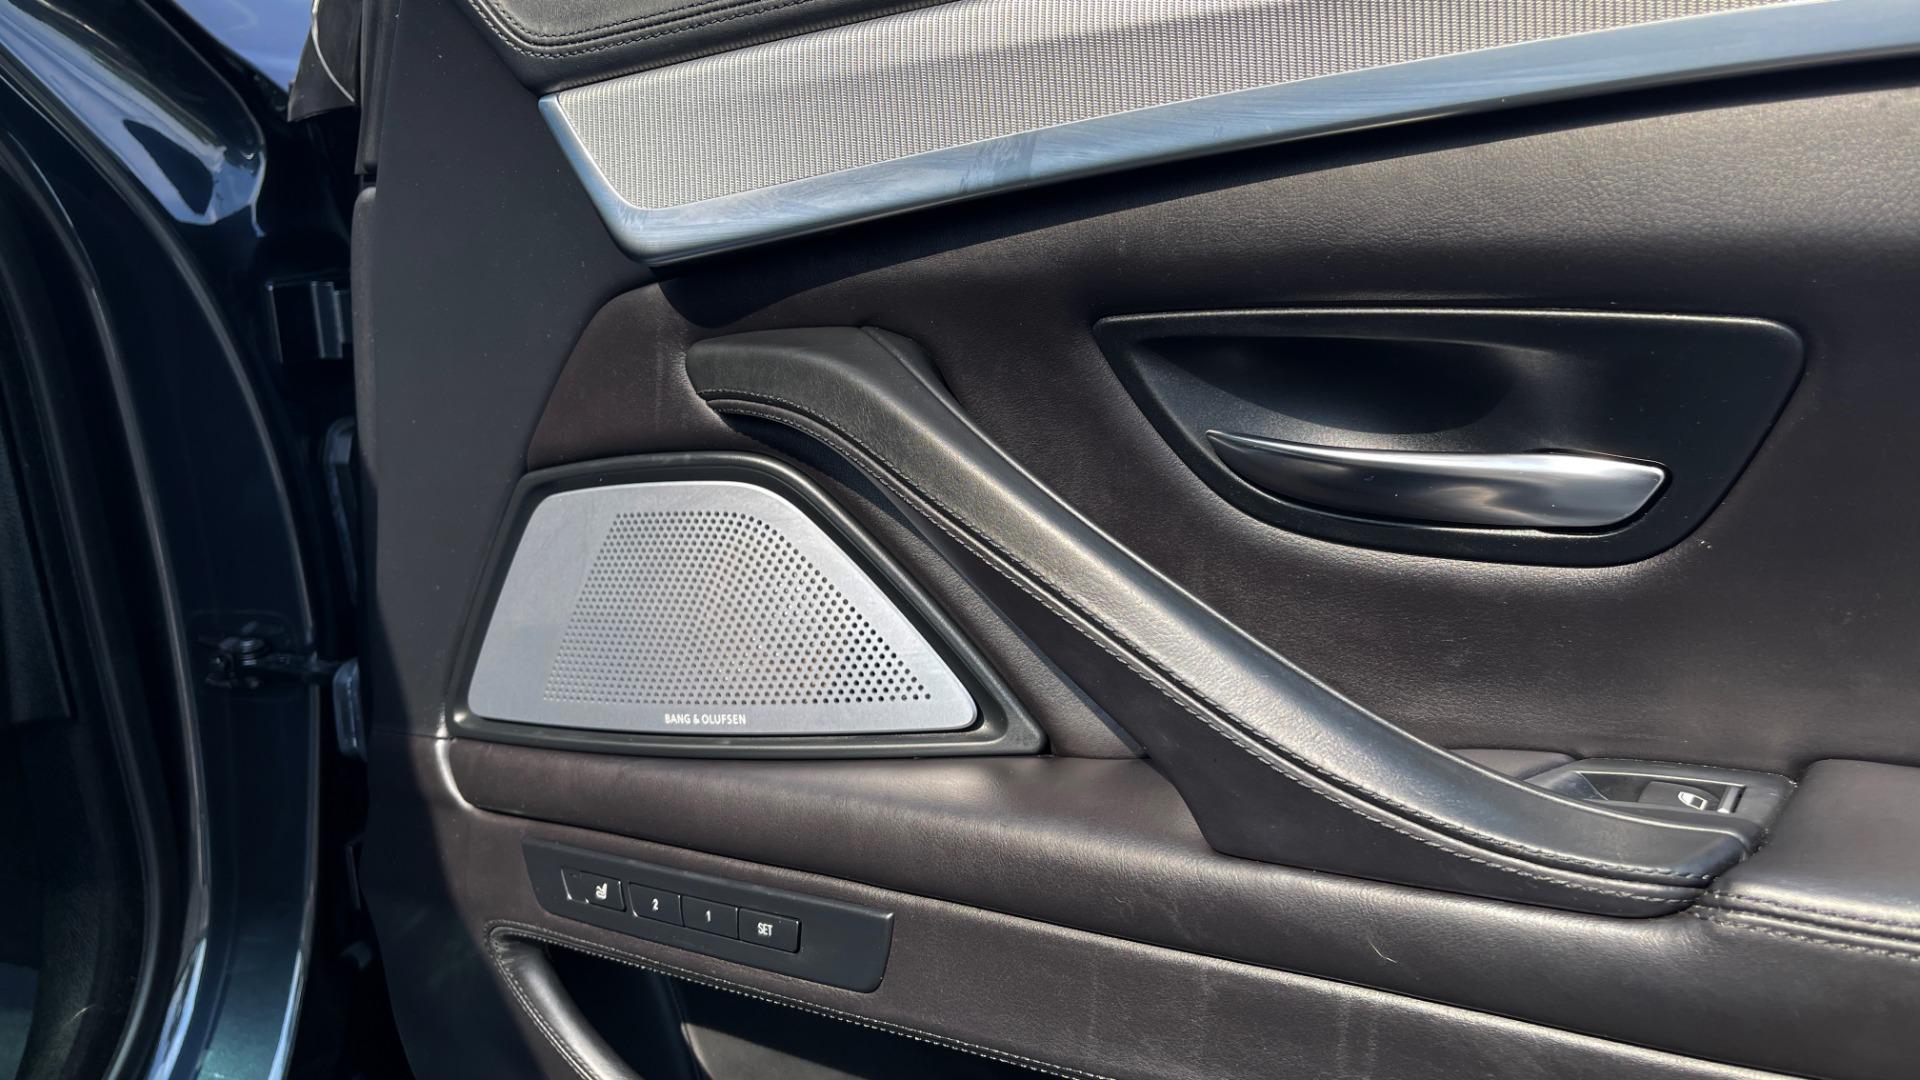 Used 2015 BMW M5 SEDAN / EXEC PKG / HUD / NAV / B&O SND / SUNROOF / REARVIEW for sale Sold at Formula Imports in Charlotte NC 28227 89